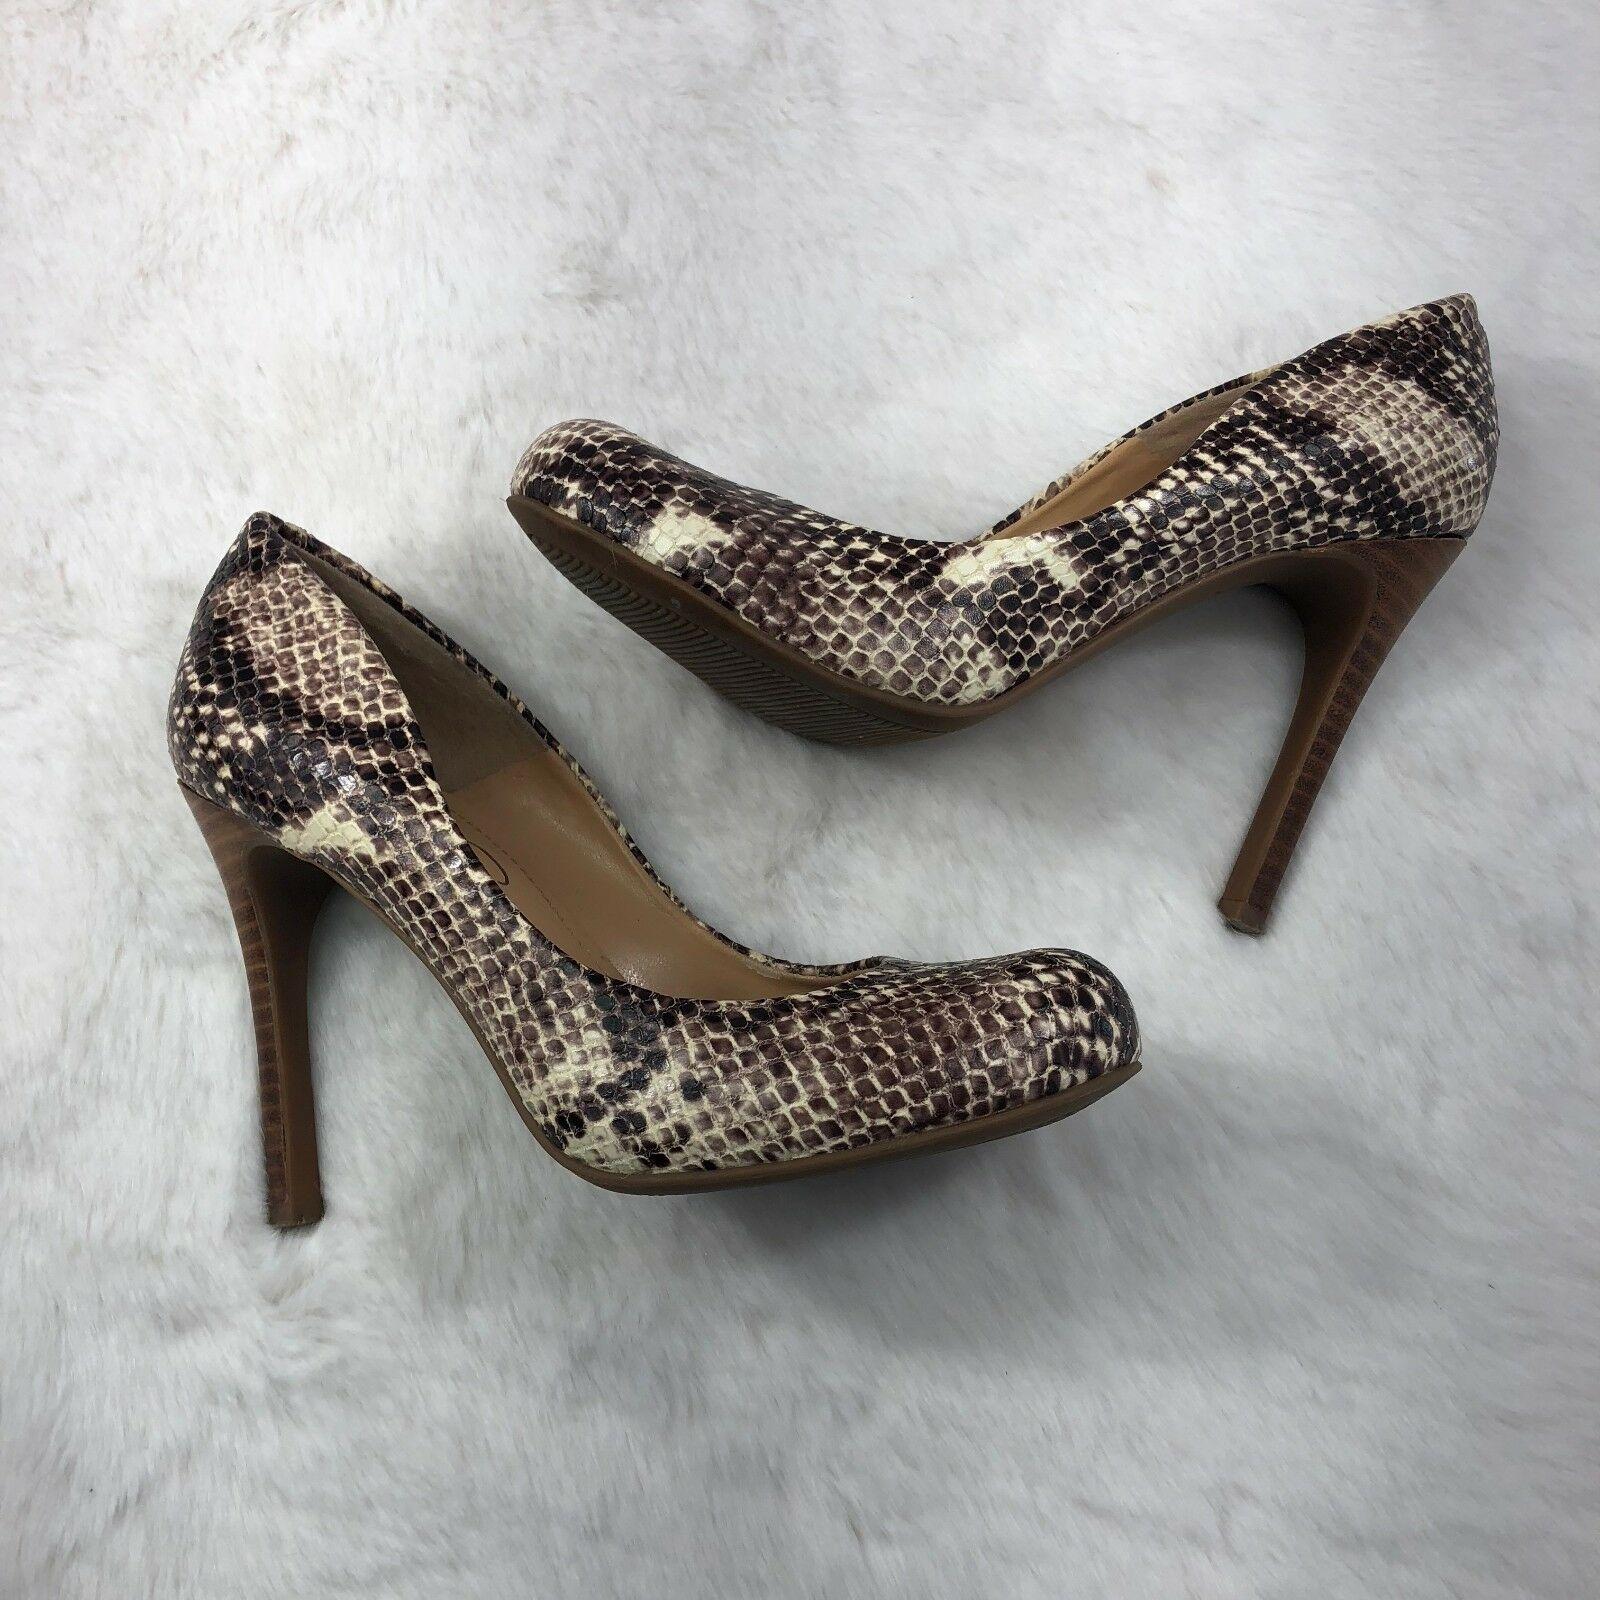 Jessica Simpson Snake skin High Heel